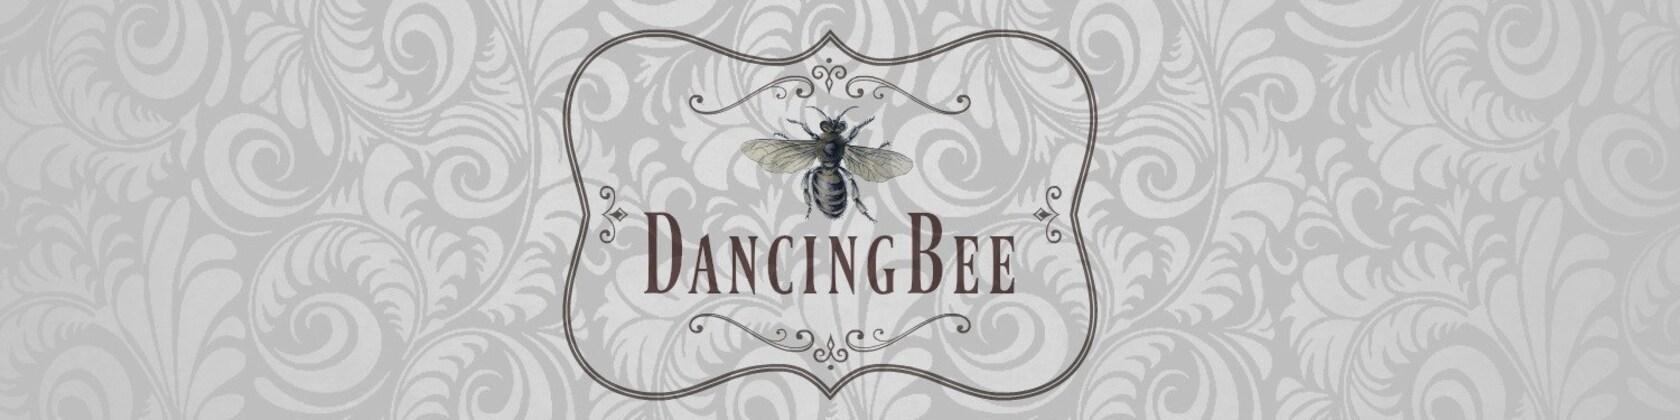 Dancing bee dolls by dancingbeedoll on etsy